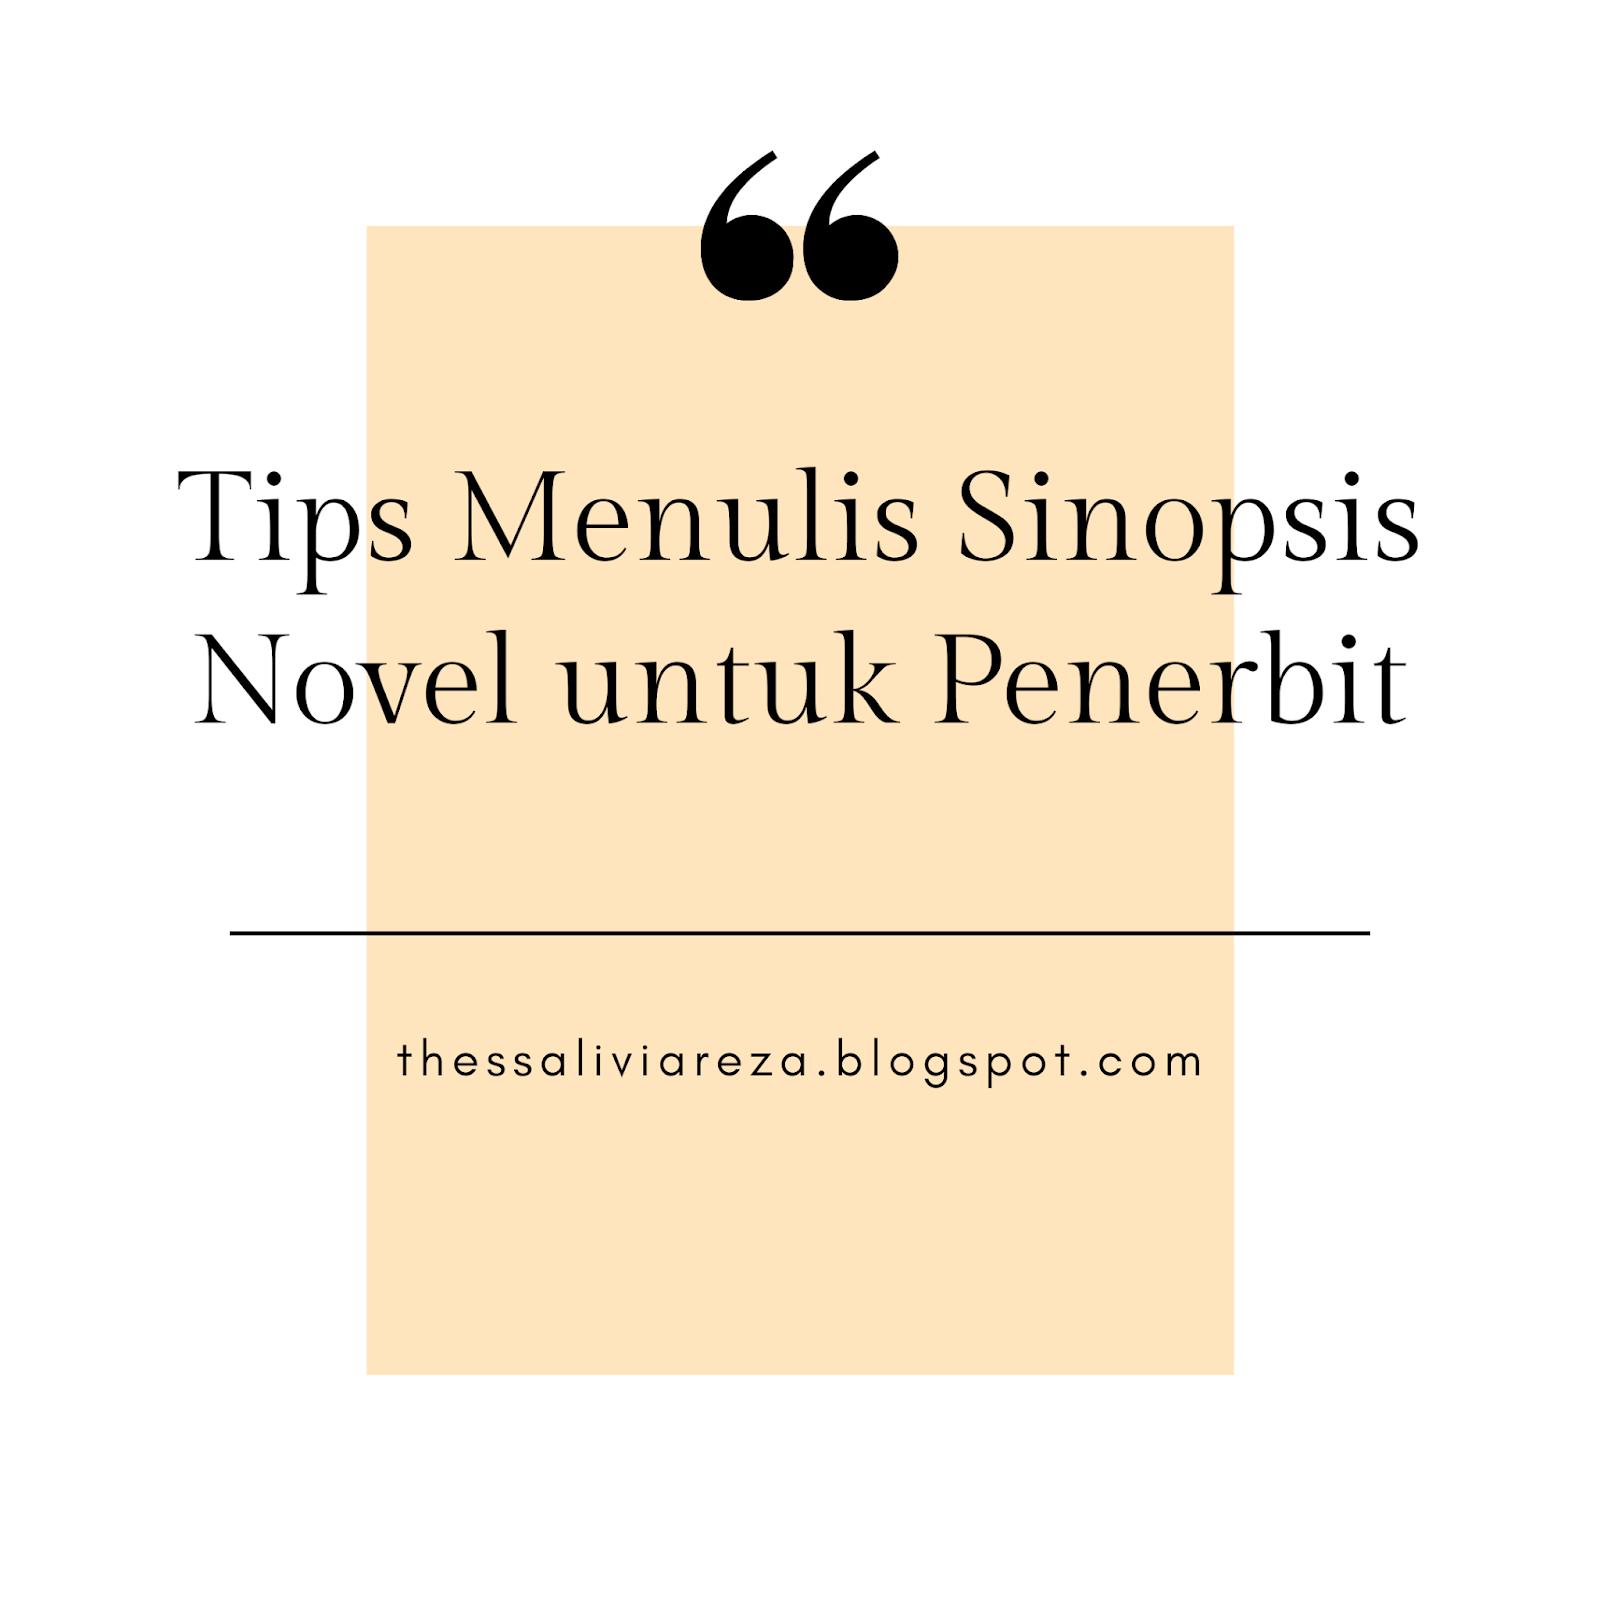 sinopsis novel untuk penerbit